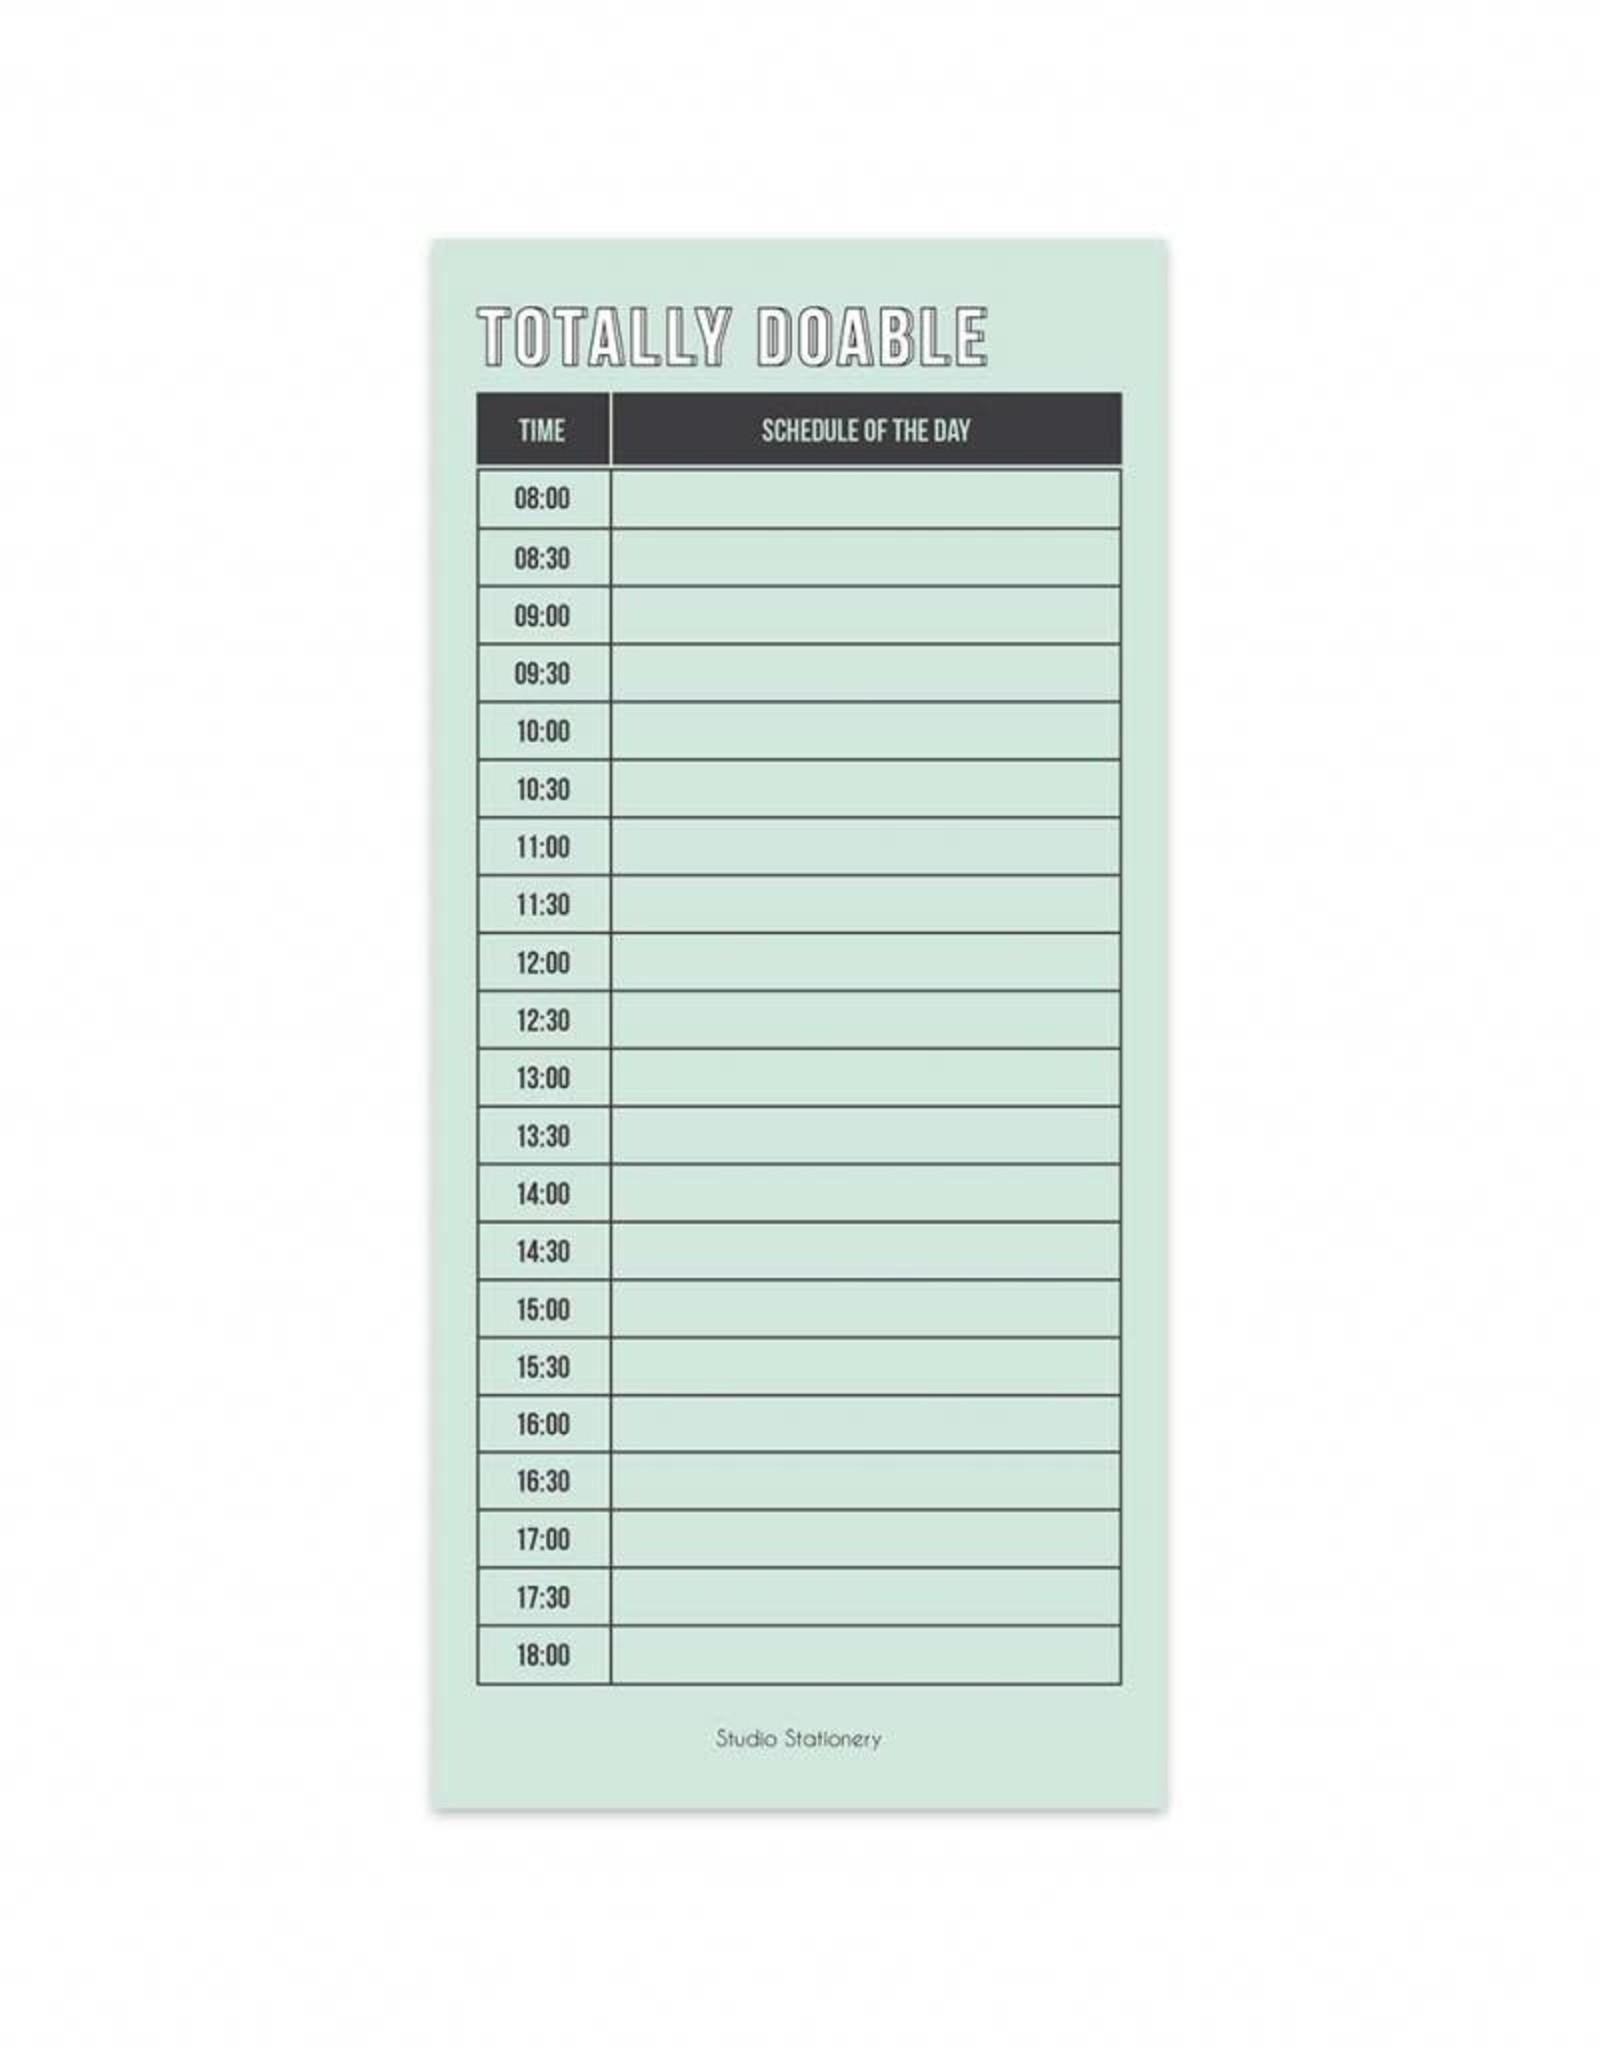 studio stationery studio stationery noteblock totally doable schedule